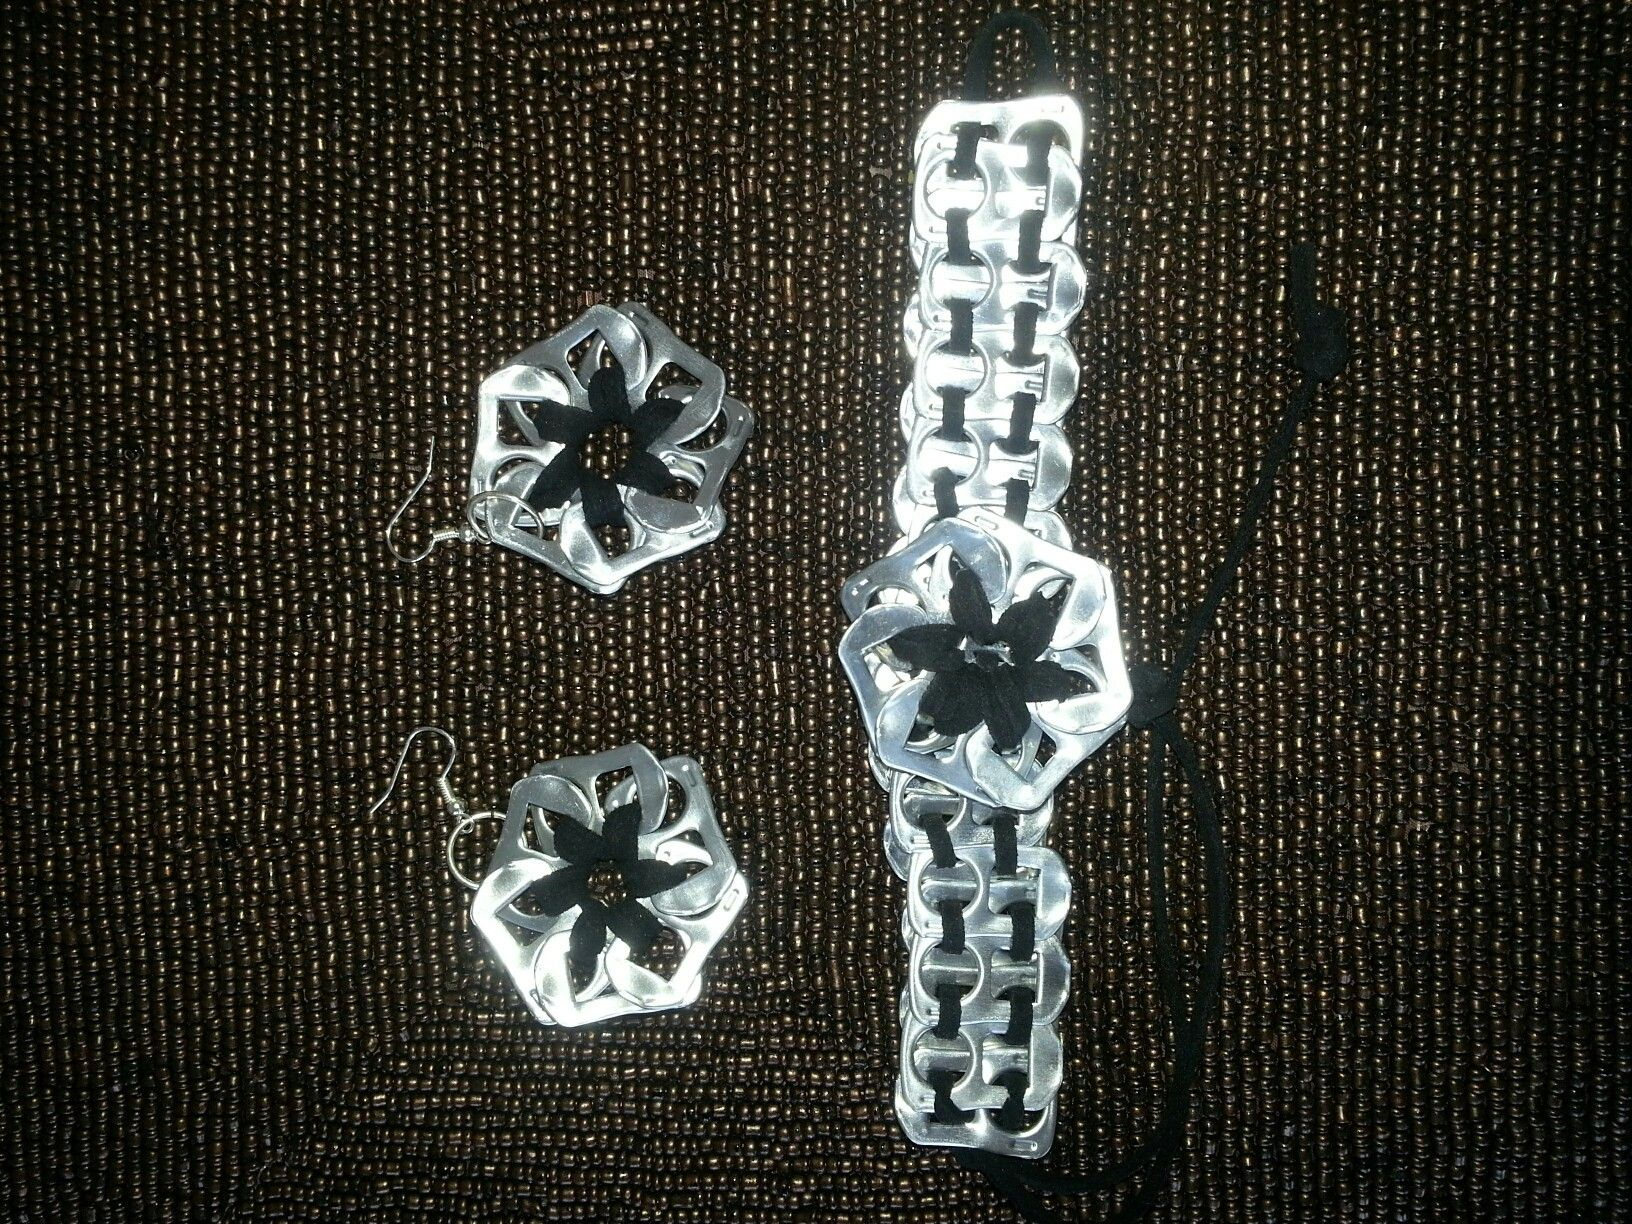 Pop can tab bracelet and earrings